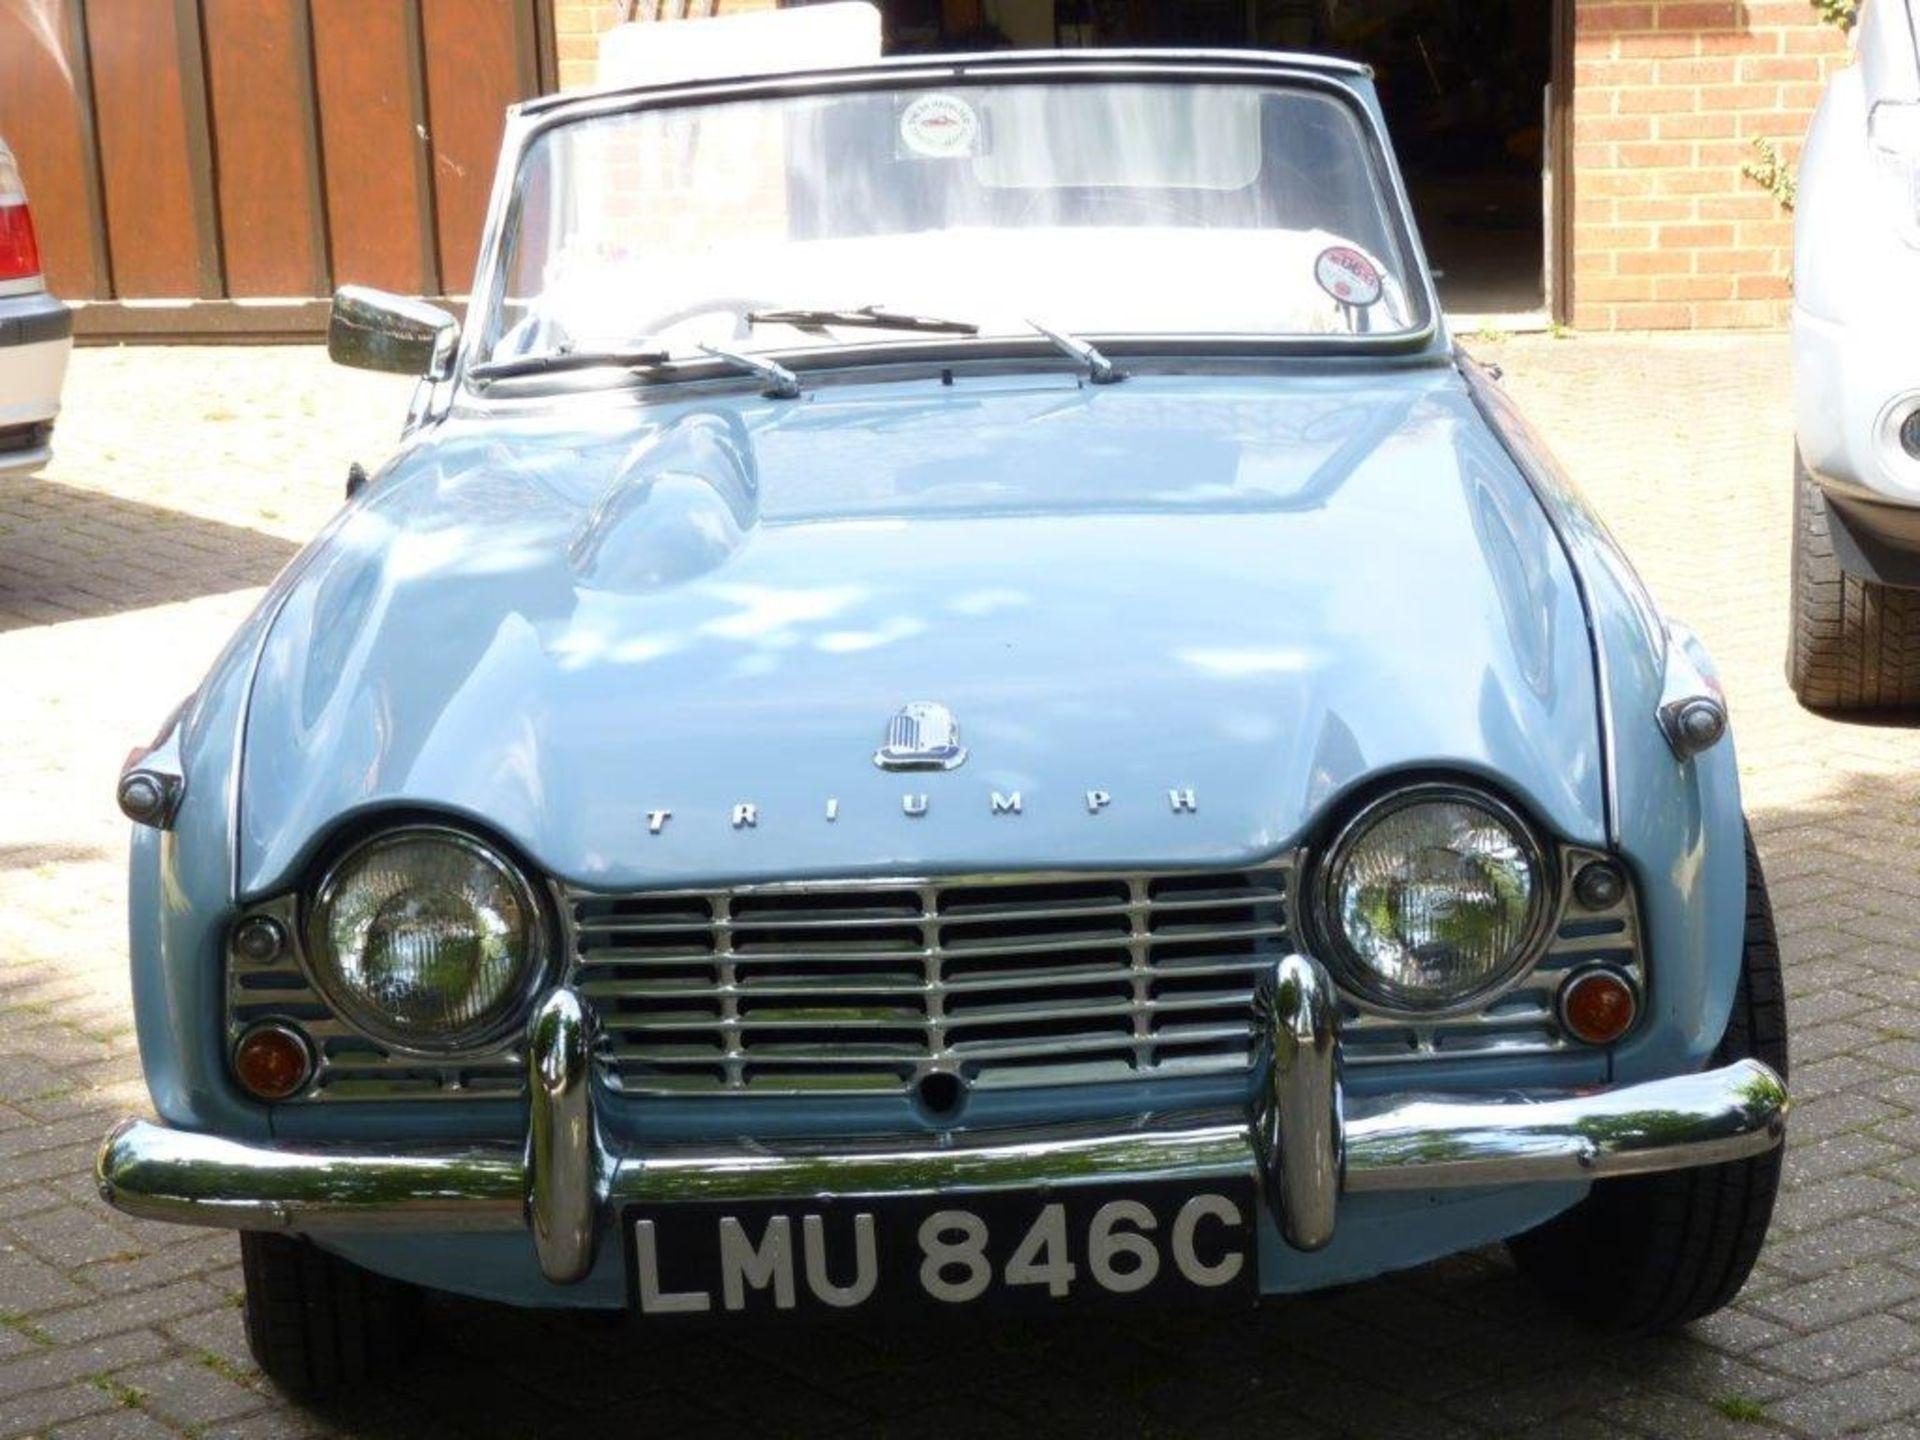 1965 Triumph TR4 - Image 4 of 17